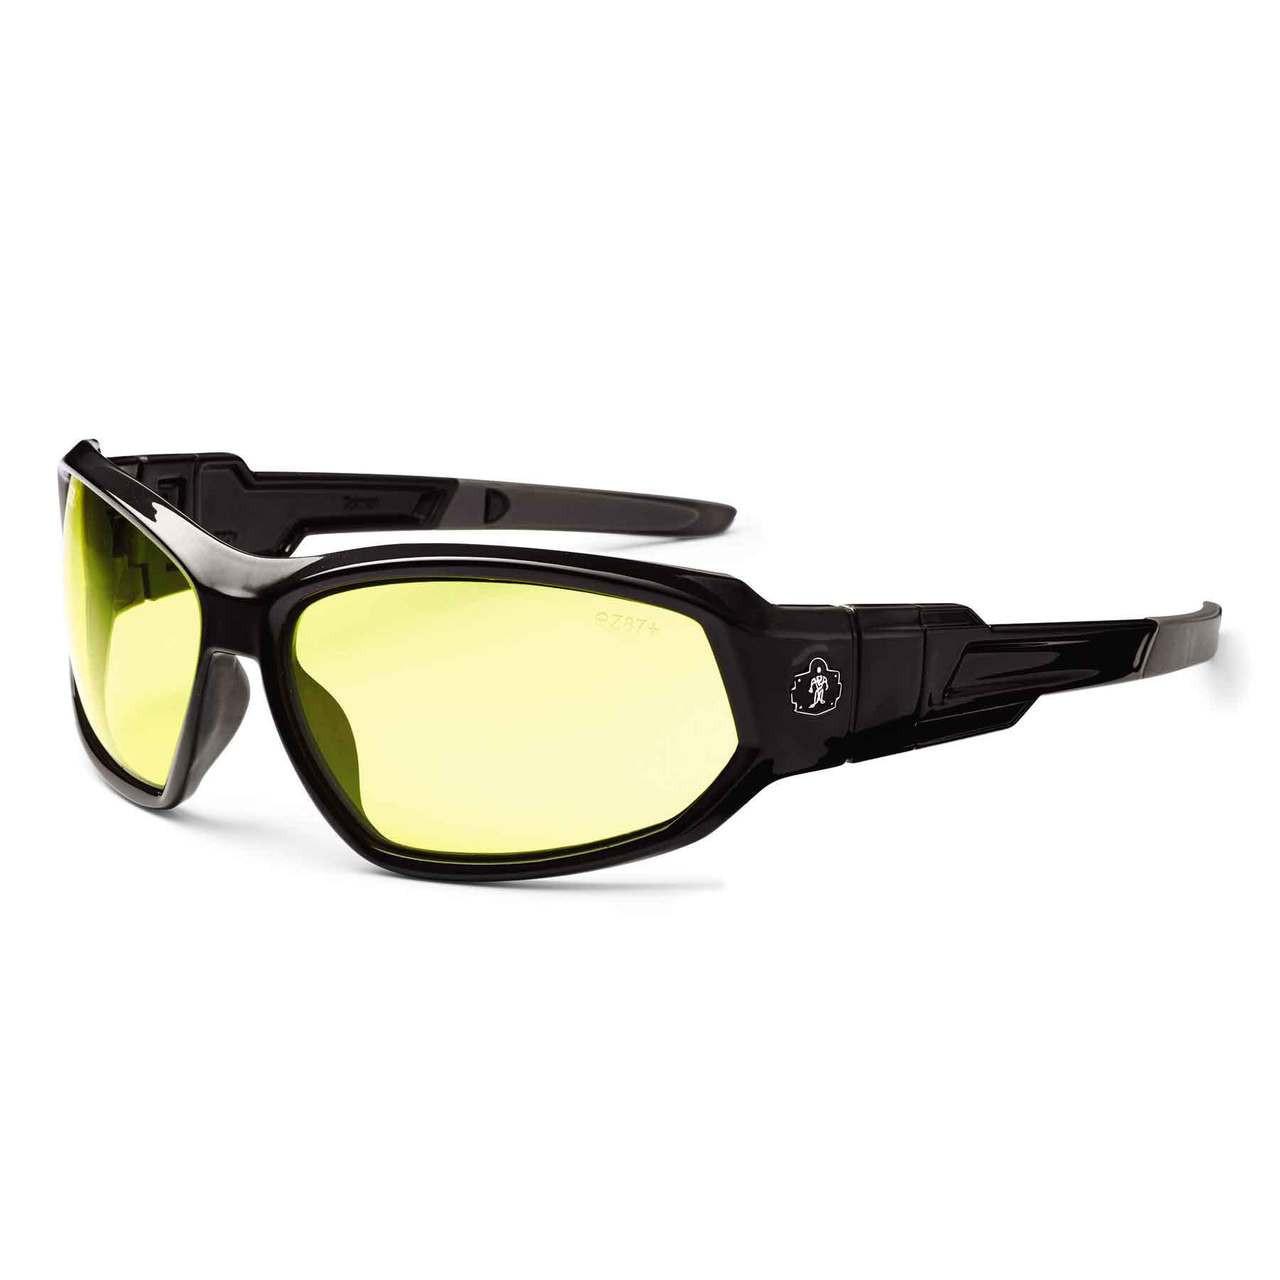 Skullerz Loki Safety Glasses Goggles and Copper Lens and Black Frame